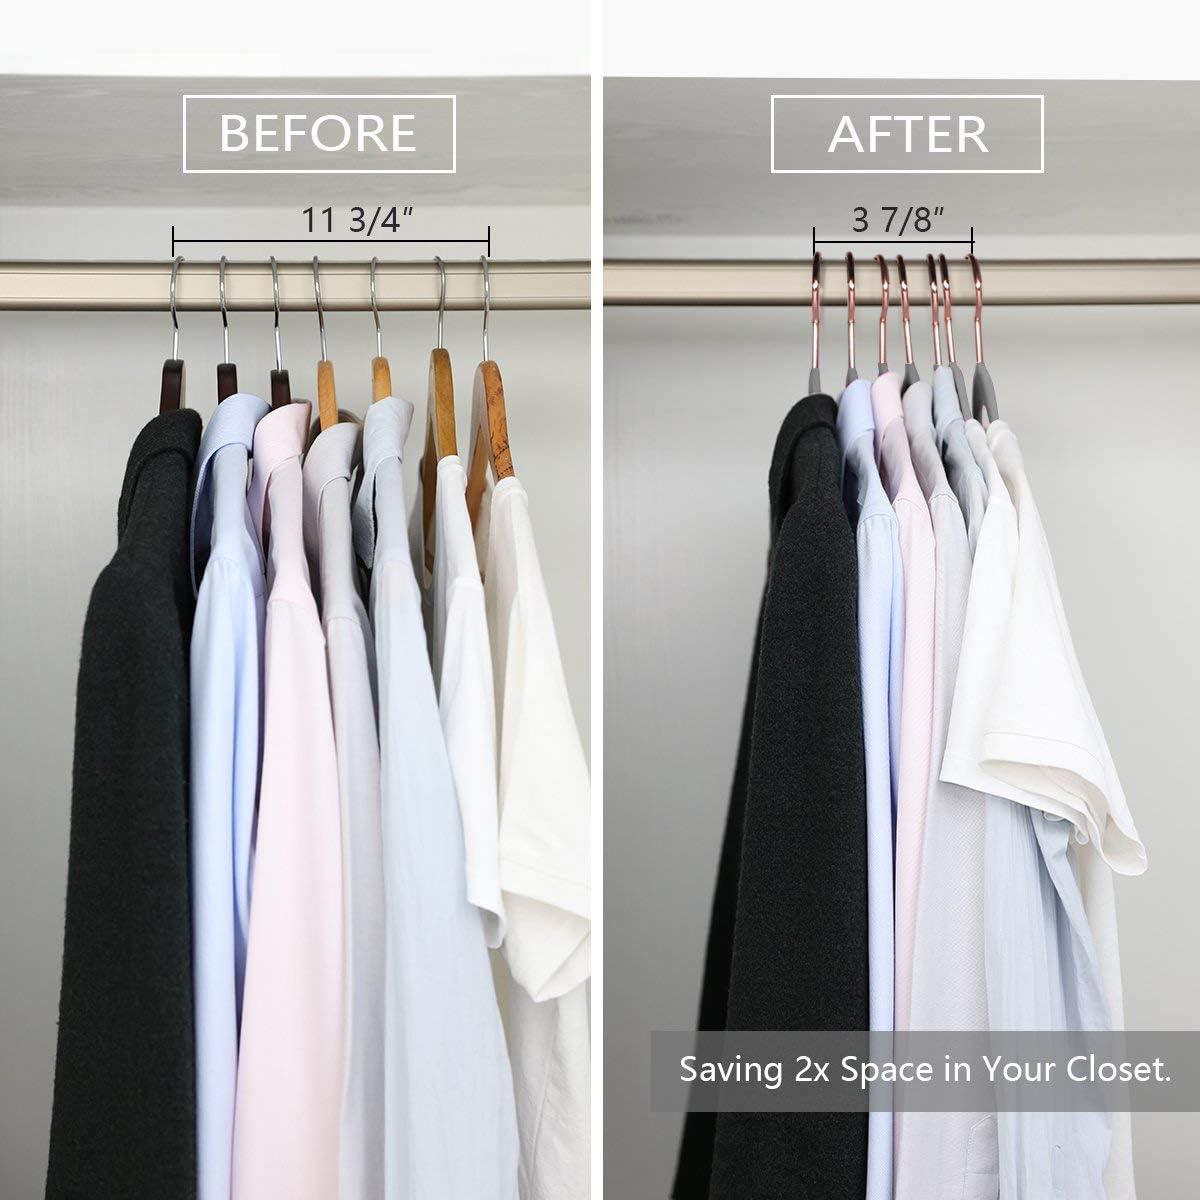 VECELO Premium Velvet Suit-Hangers Pack of 50 Heavy Duty Non Slip Space-Saving with Tie Rack and Finger Clips Pink